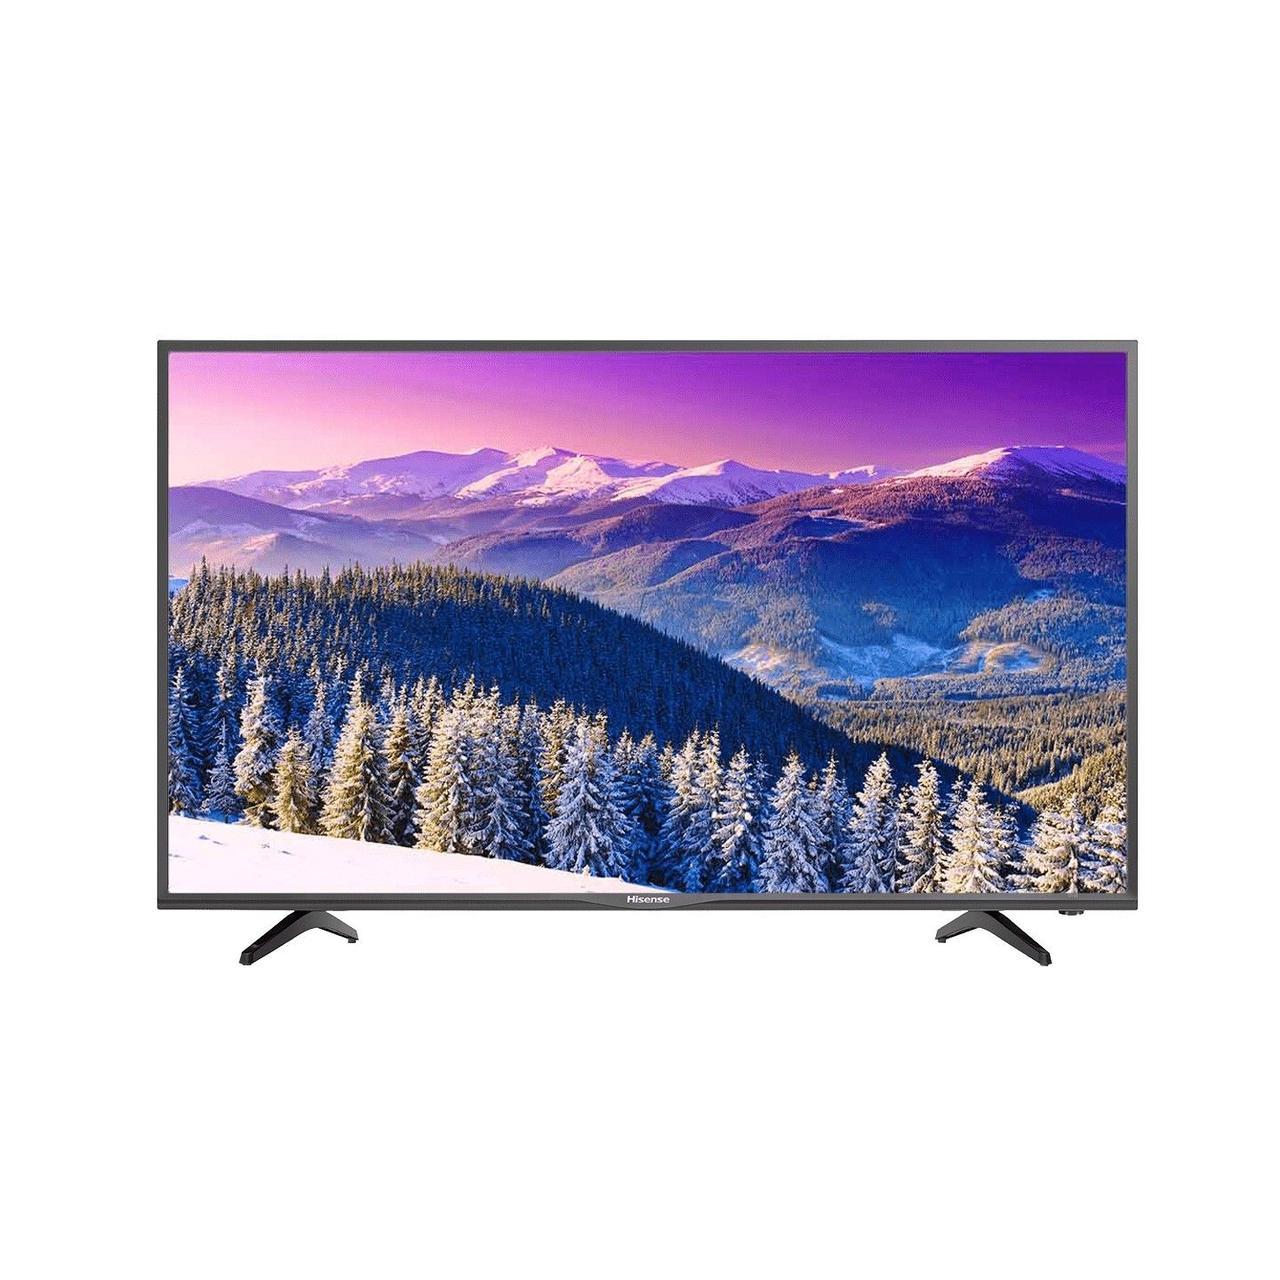 Телевизор YASIN LED-50E5000K SMART, WI-FI, 4K, Android TV